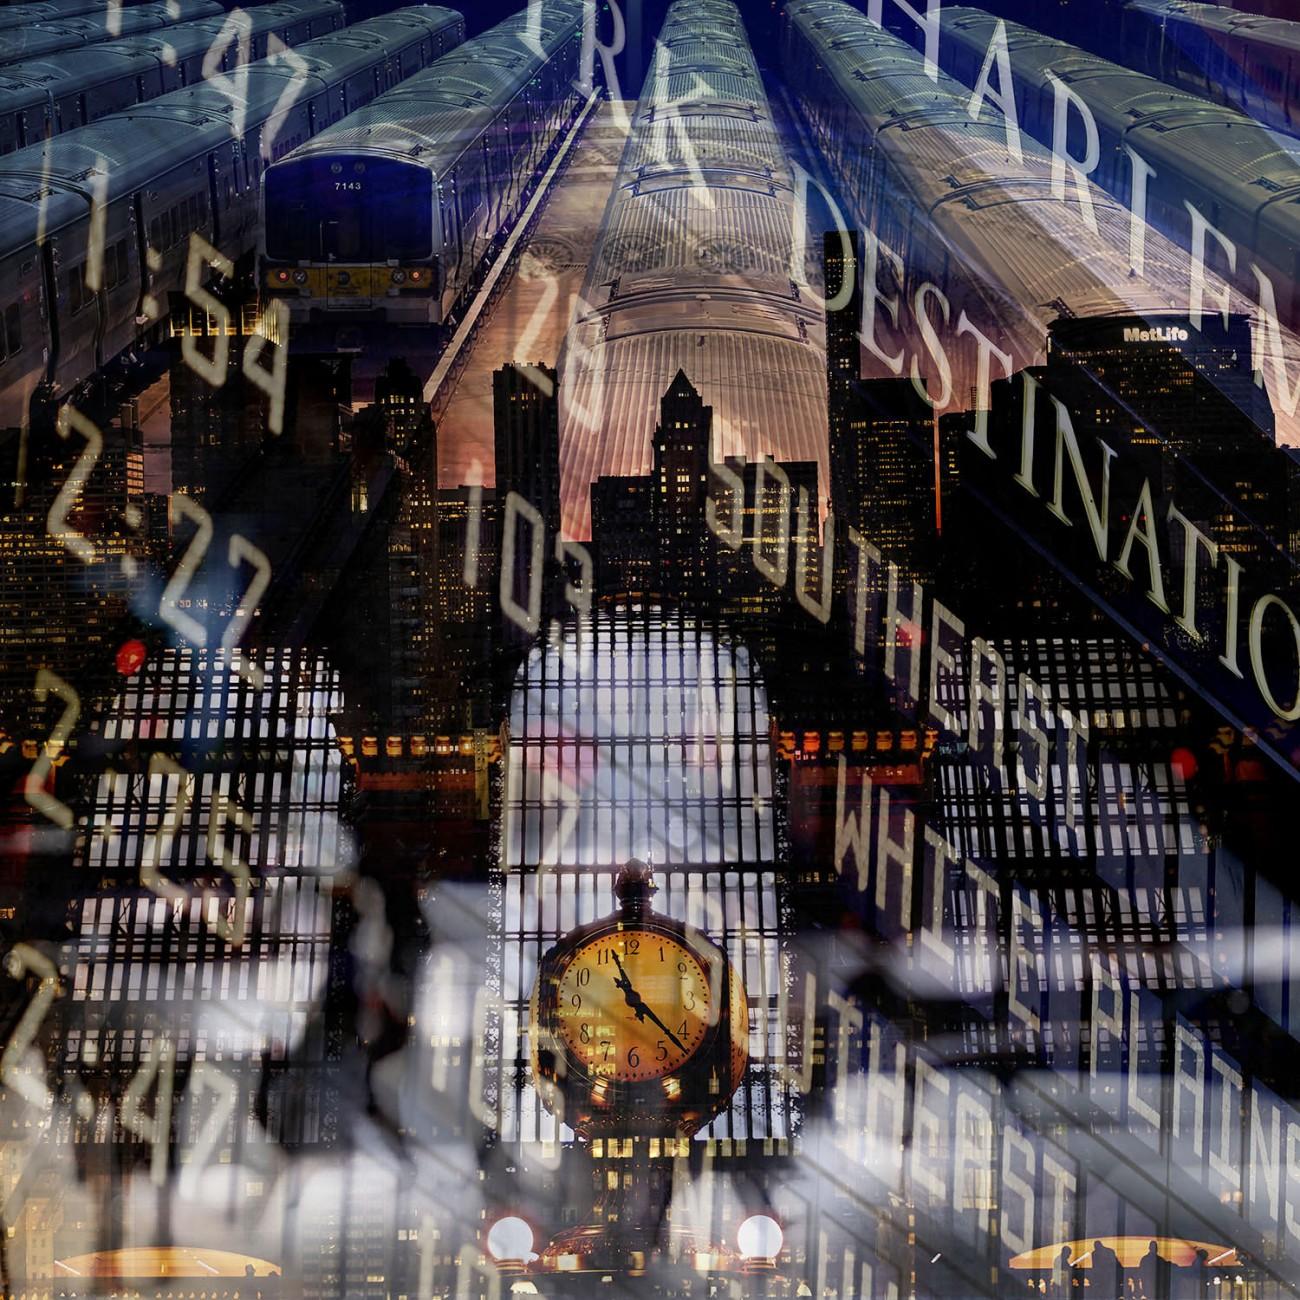 Metropolis - All Aboard!, NY, 2016